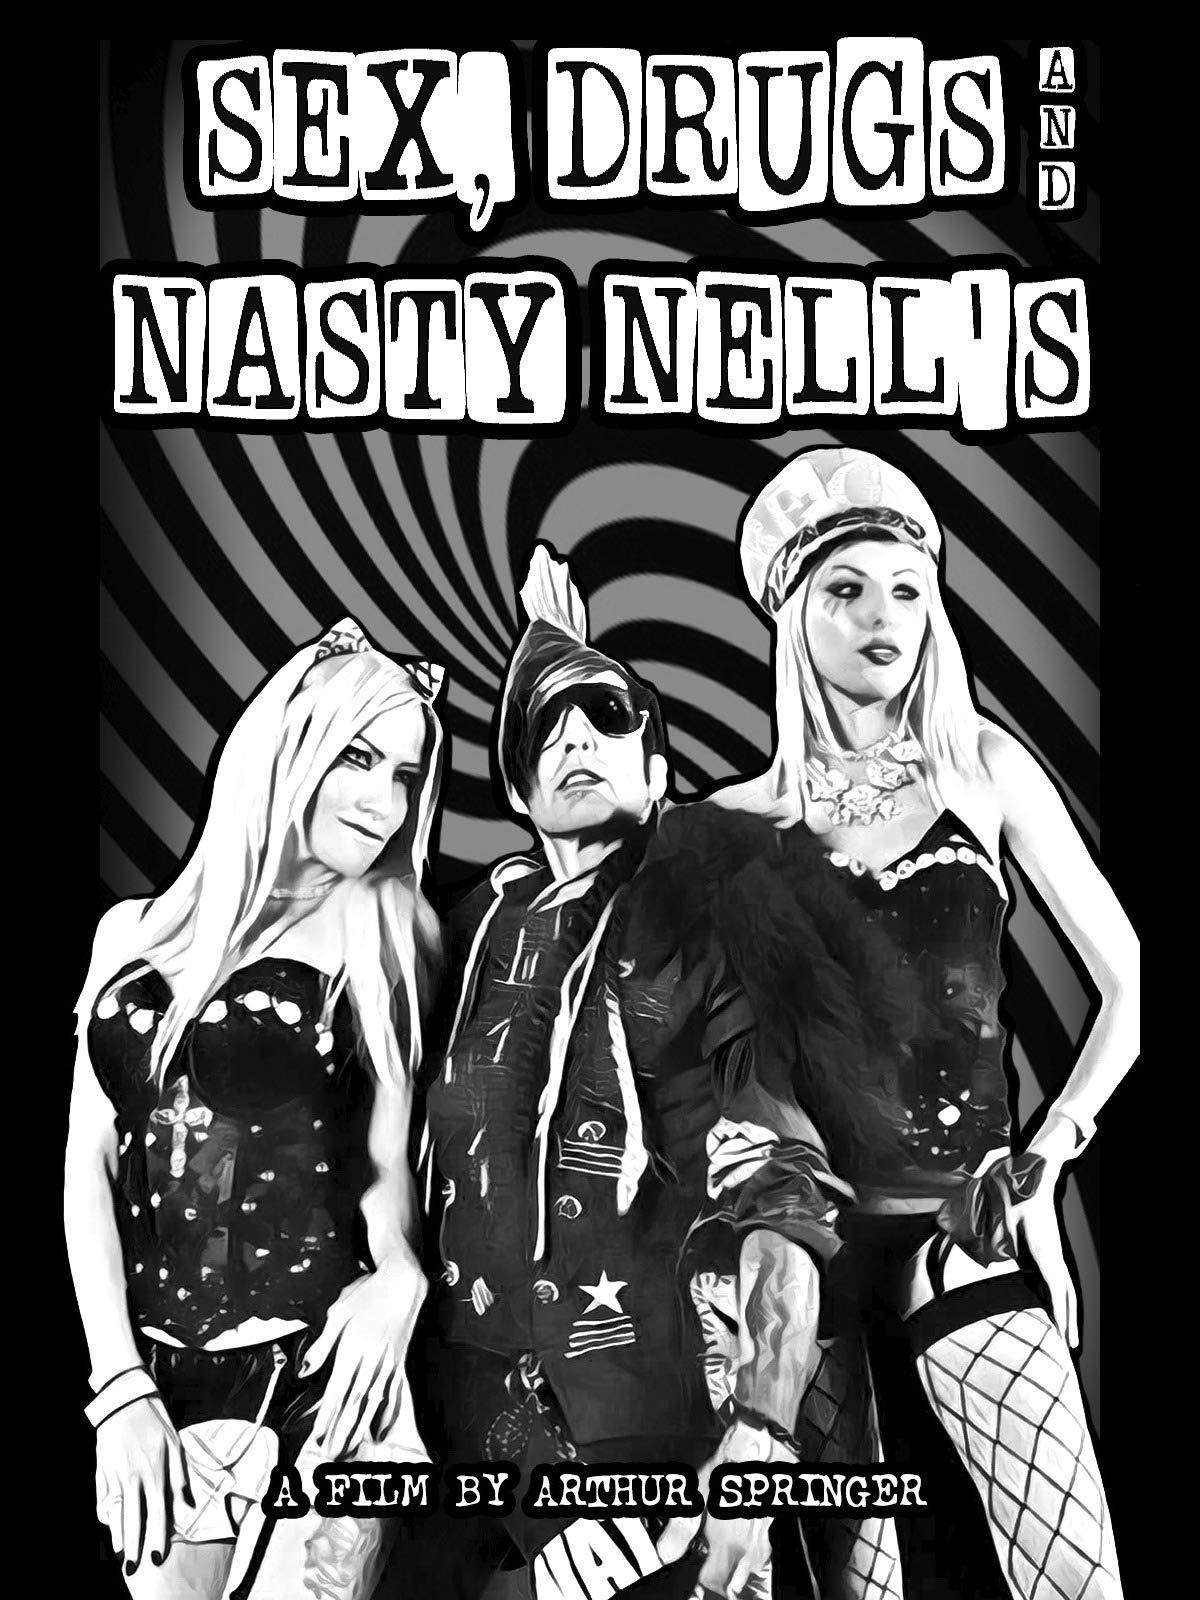 Sex, Drugs & Nasty Nell's